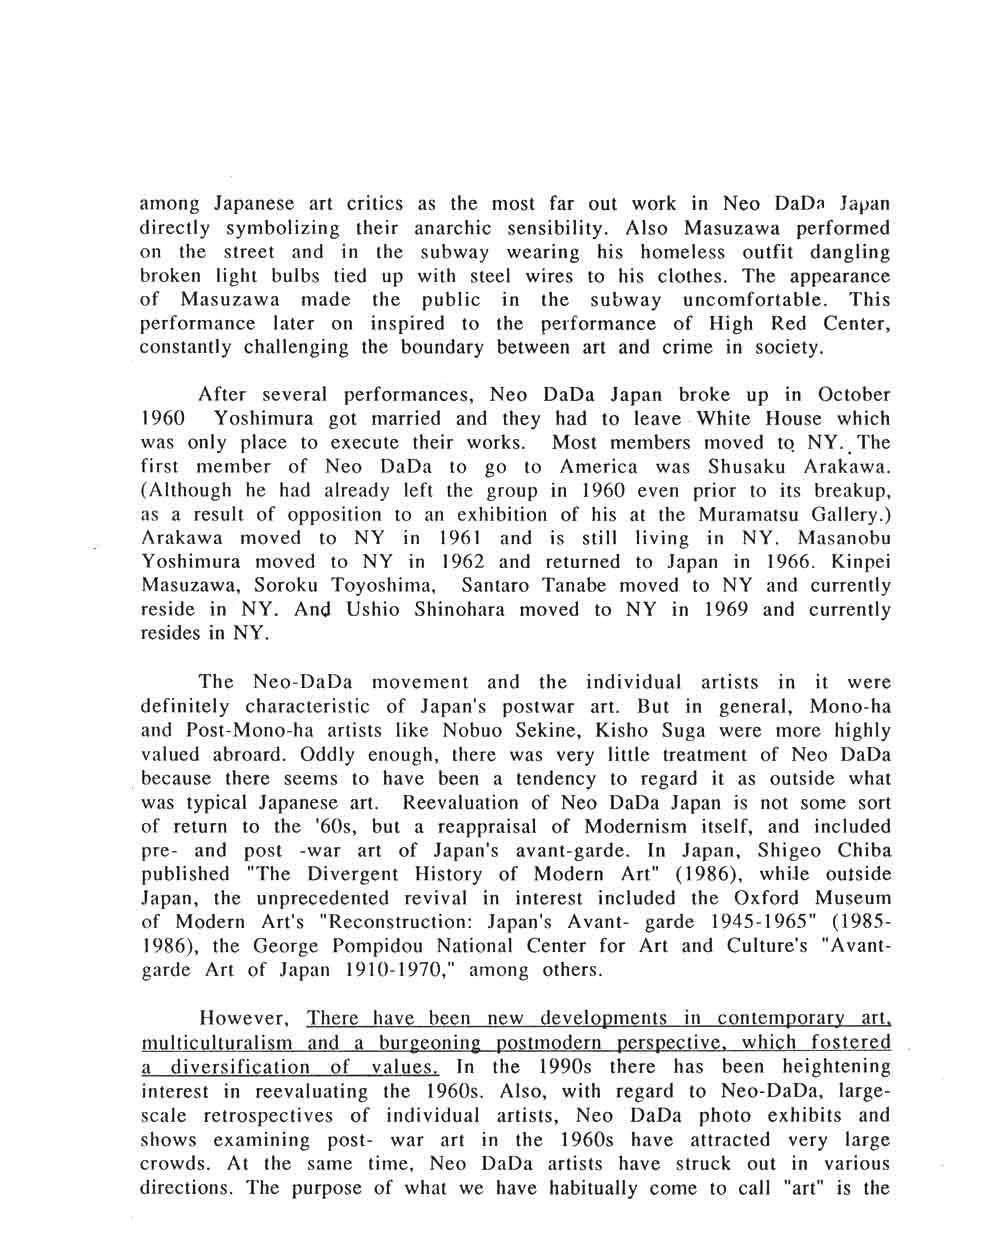 Neo DaDa Japan 1958-1998, essay, pg 5